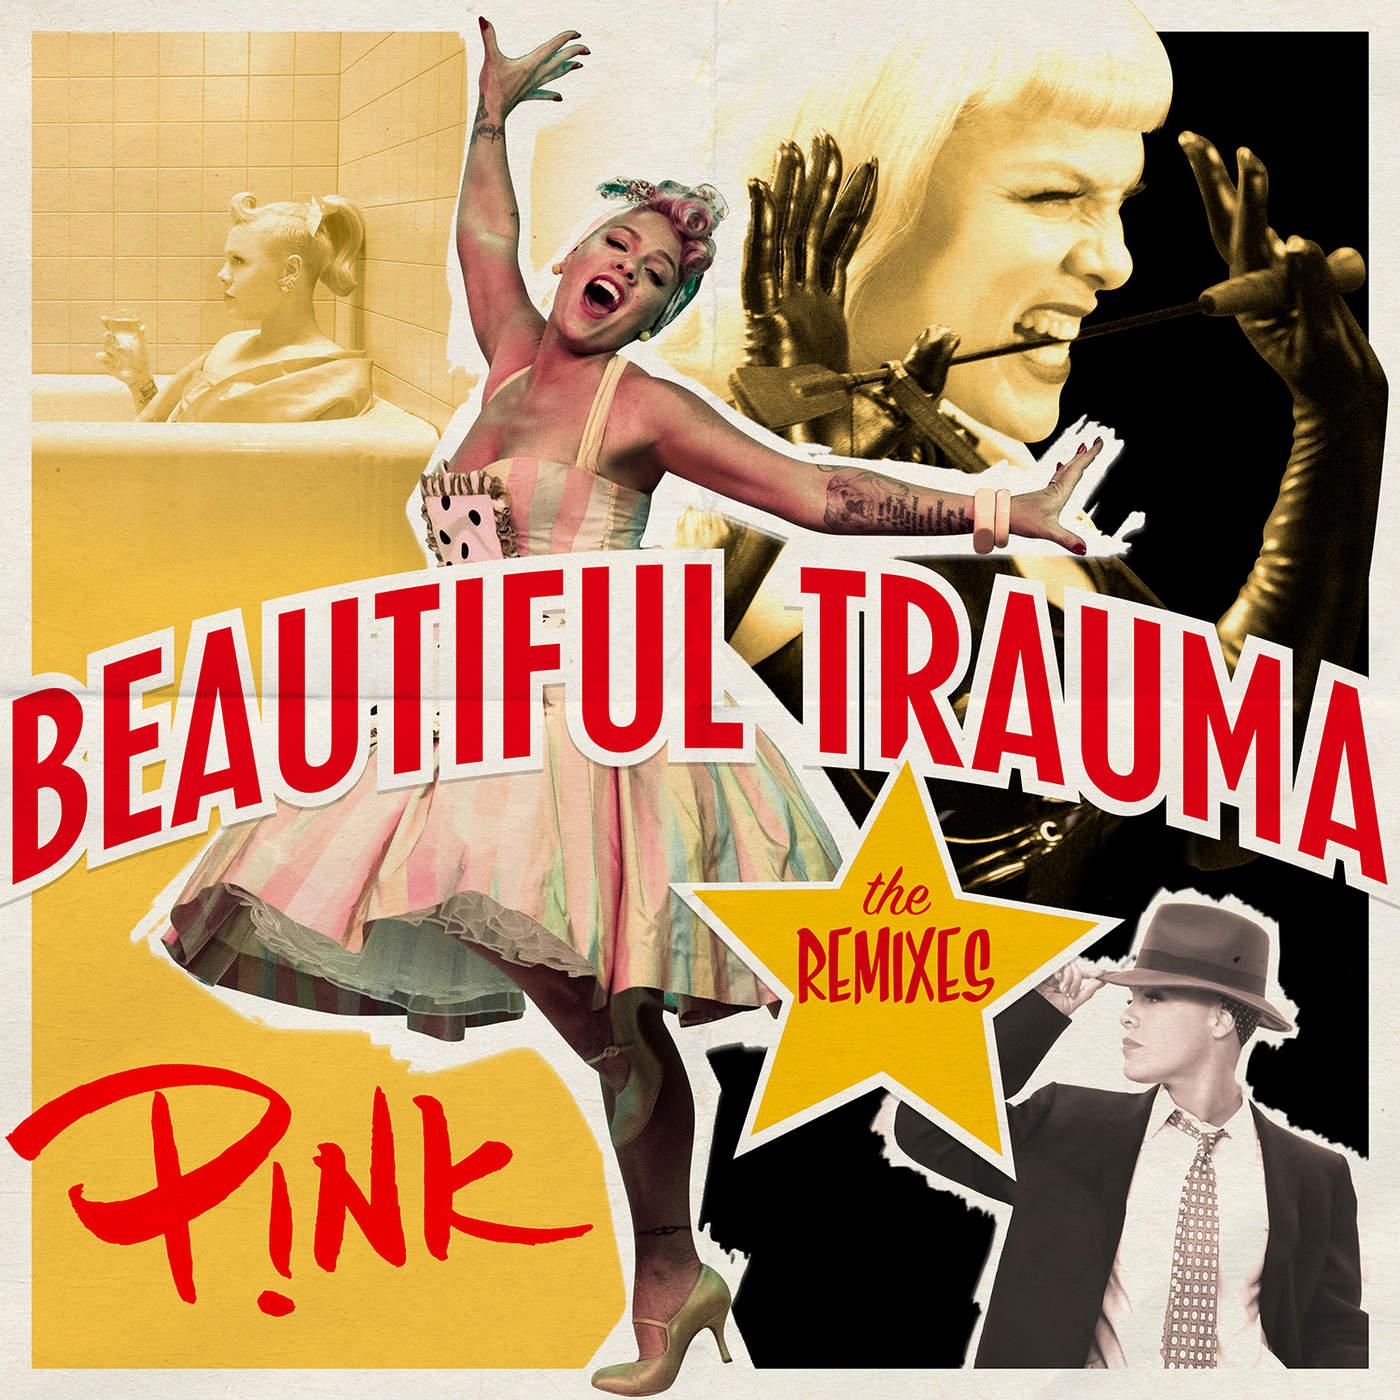 P!nk - Beautiful Trauma (The Remixes) - EP Cover